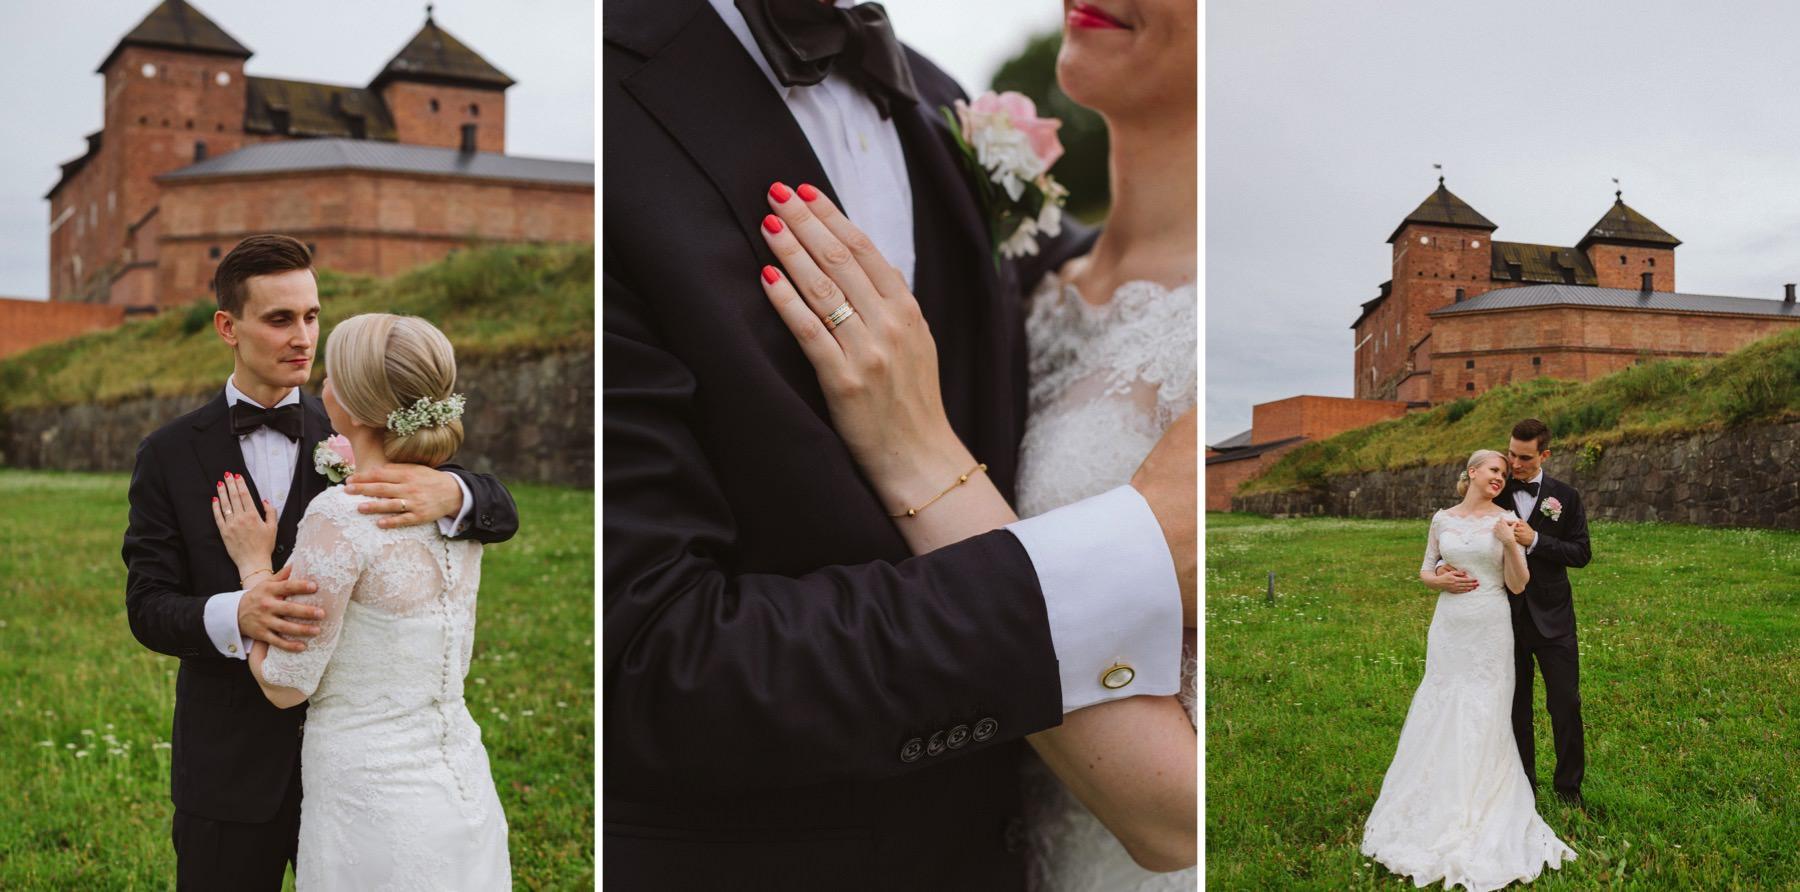 Hämeenlinna wedding photographer